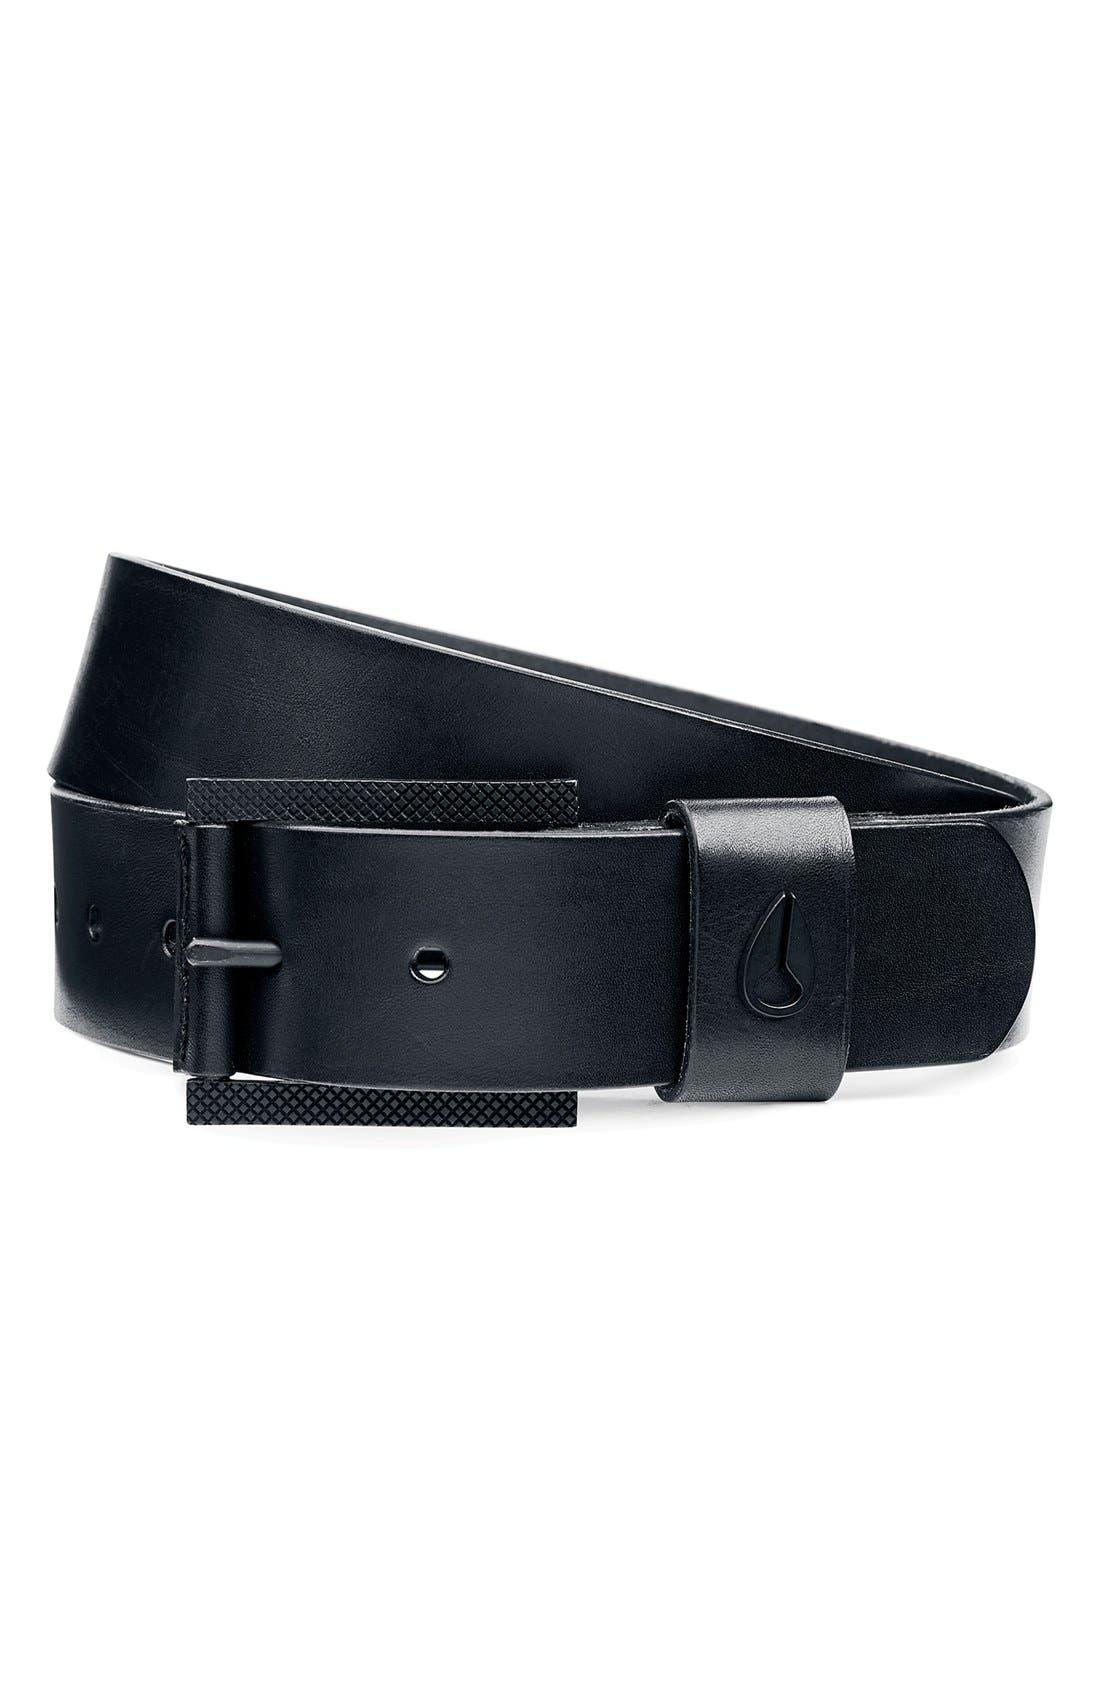 Main Image - Nixon 'Americana' Leather Belt